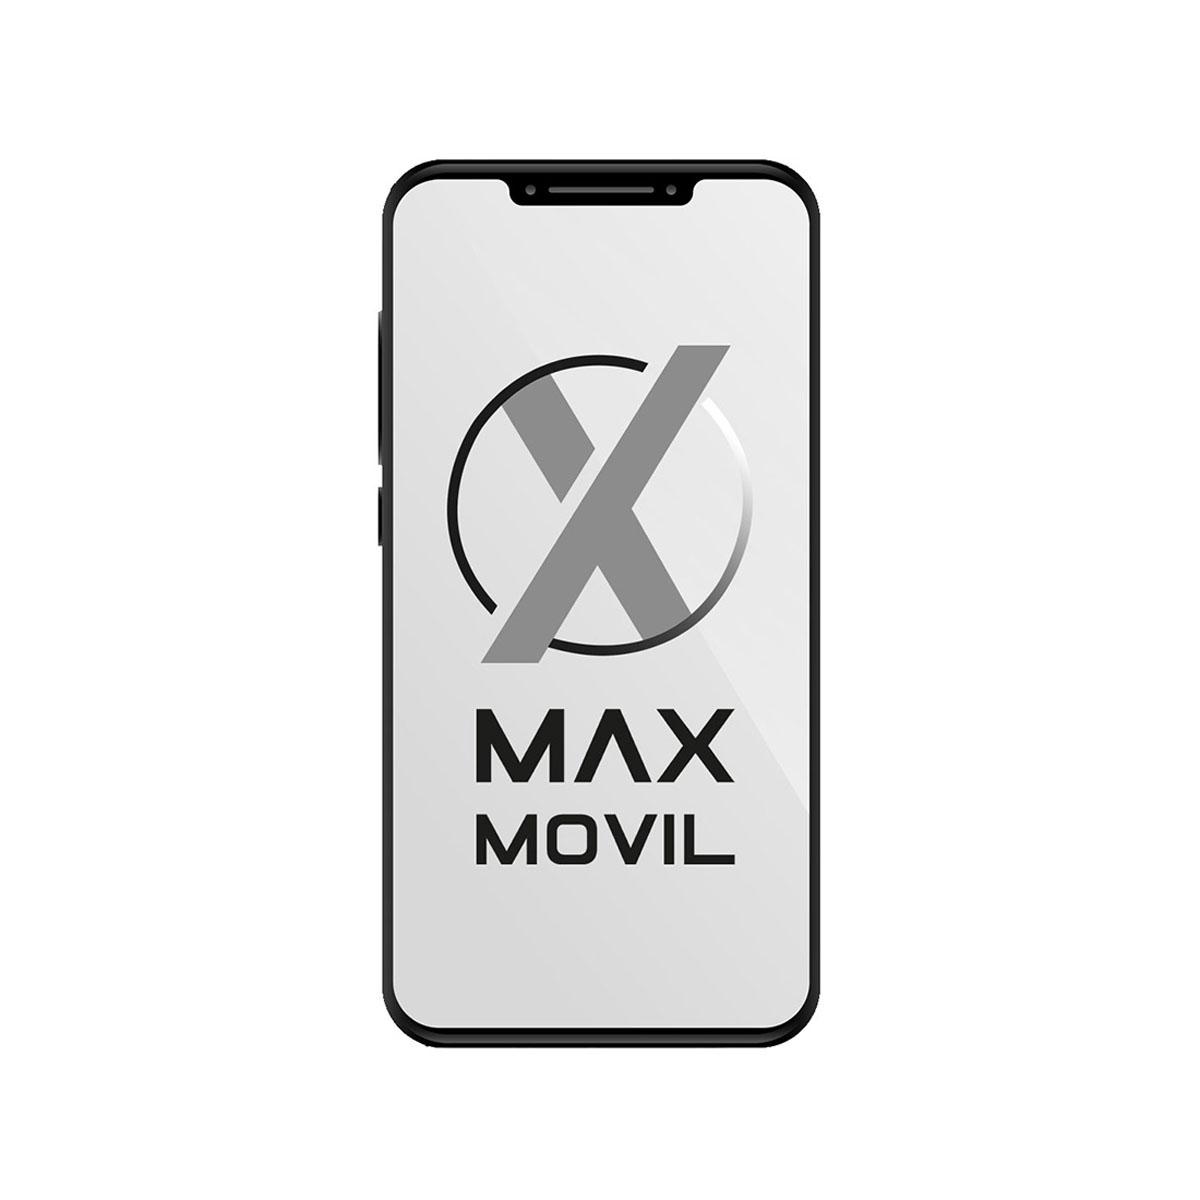 Modulo multimedia Minijack Keystone Keynet 45x22,5 blanco, conexión por Clip.